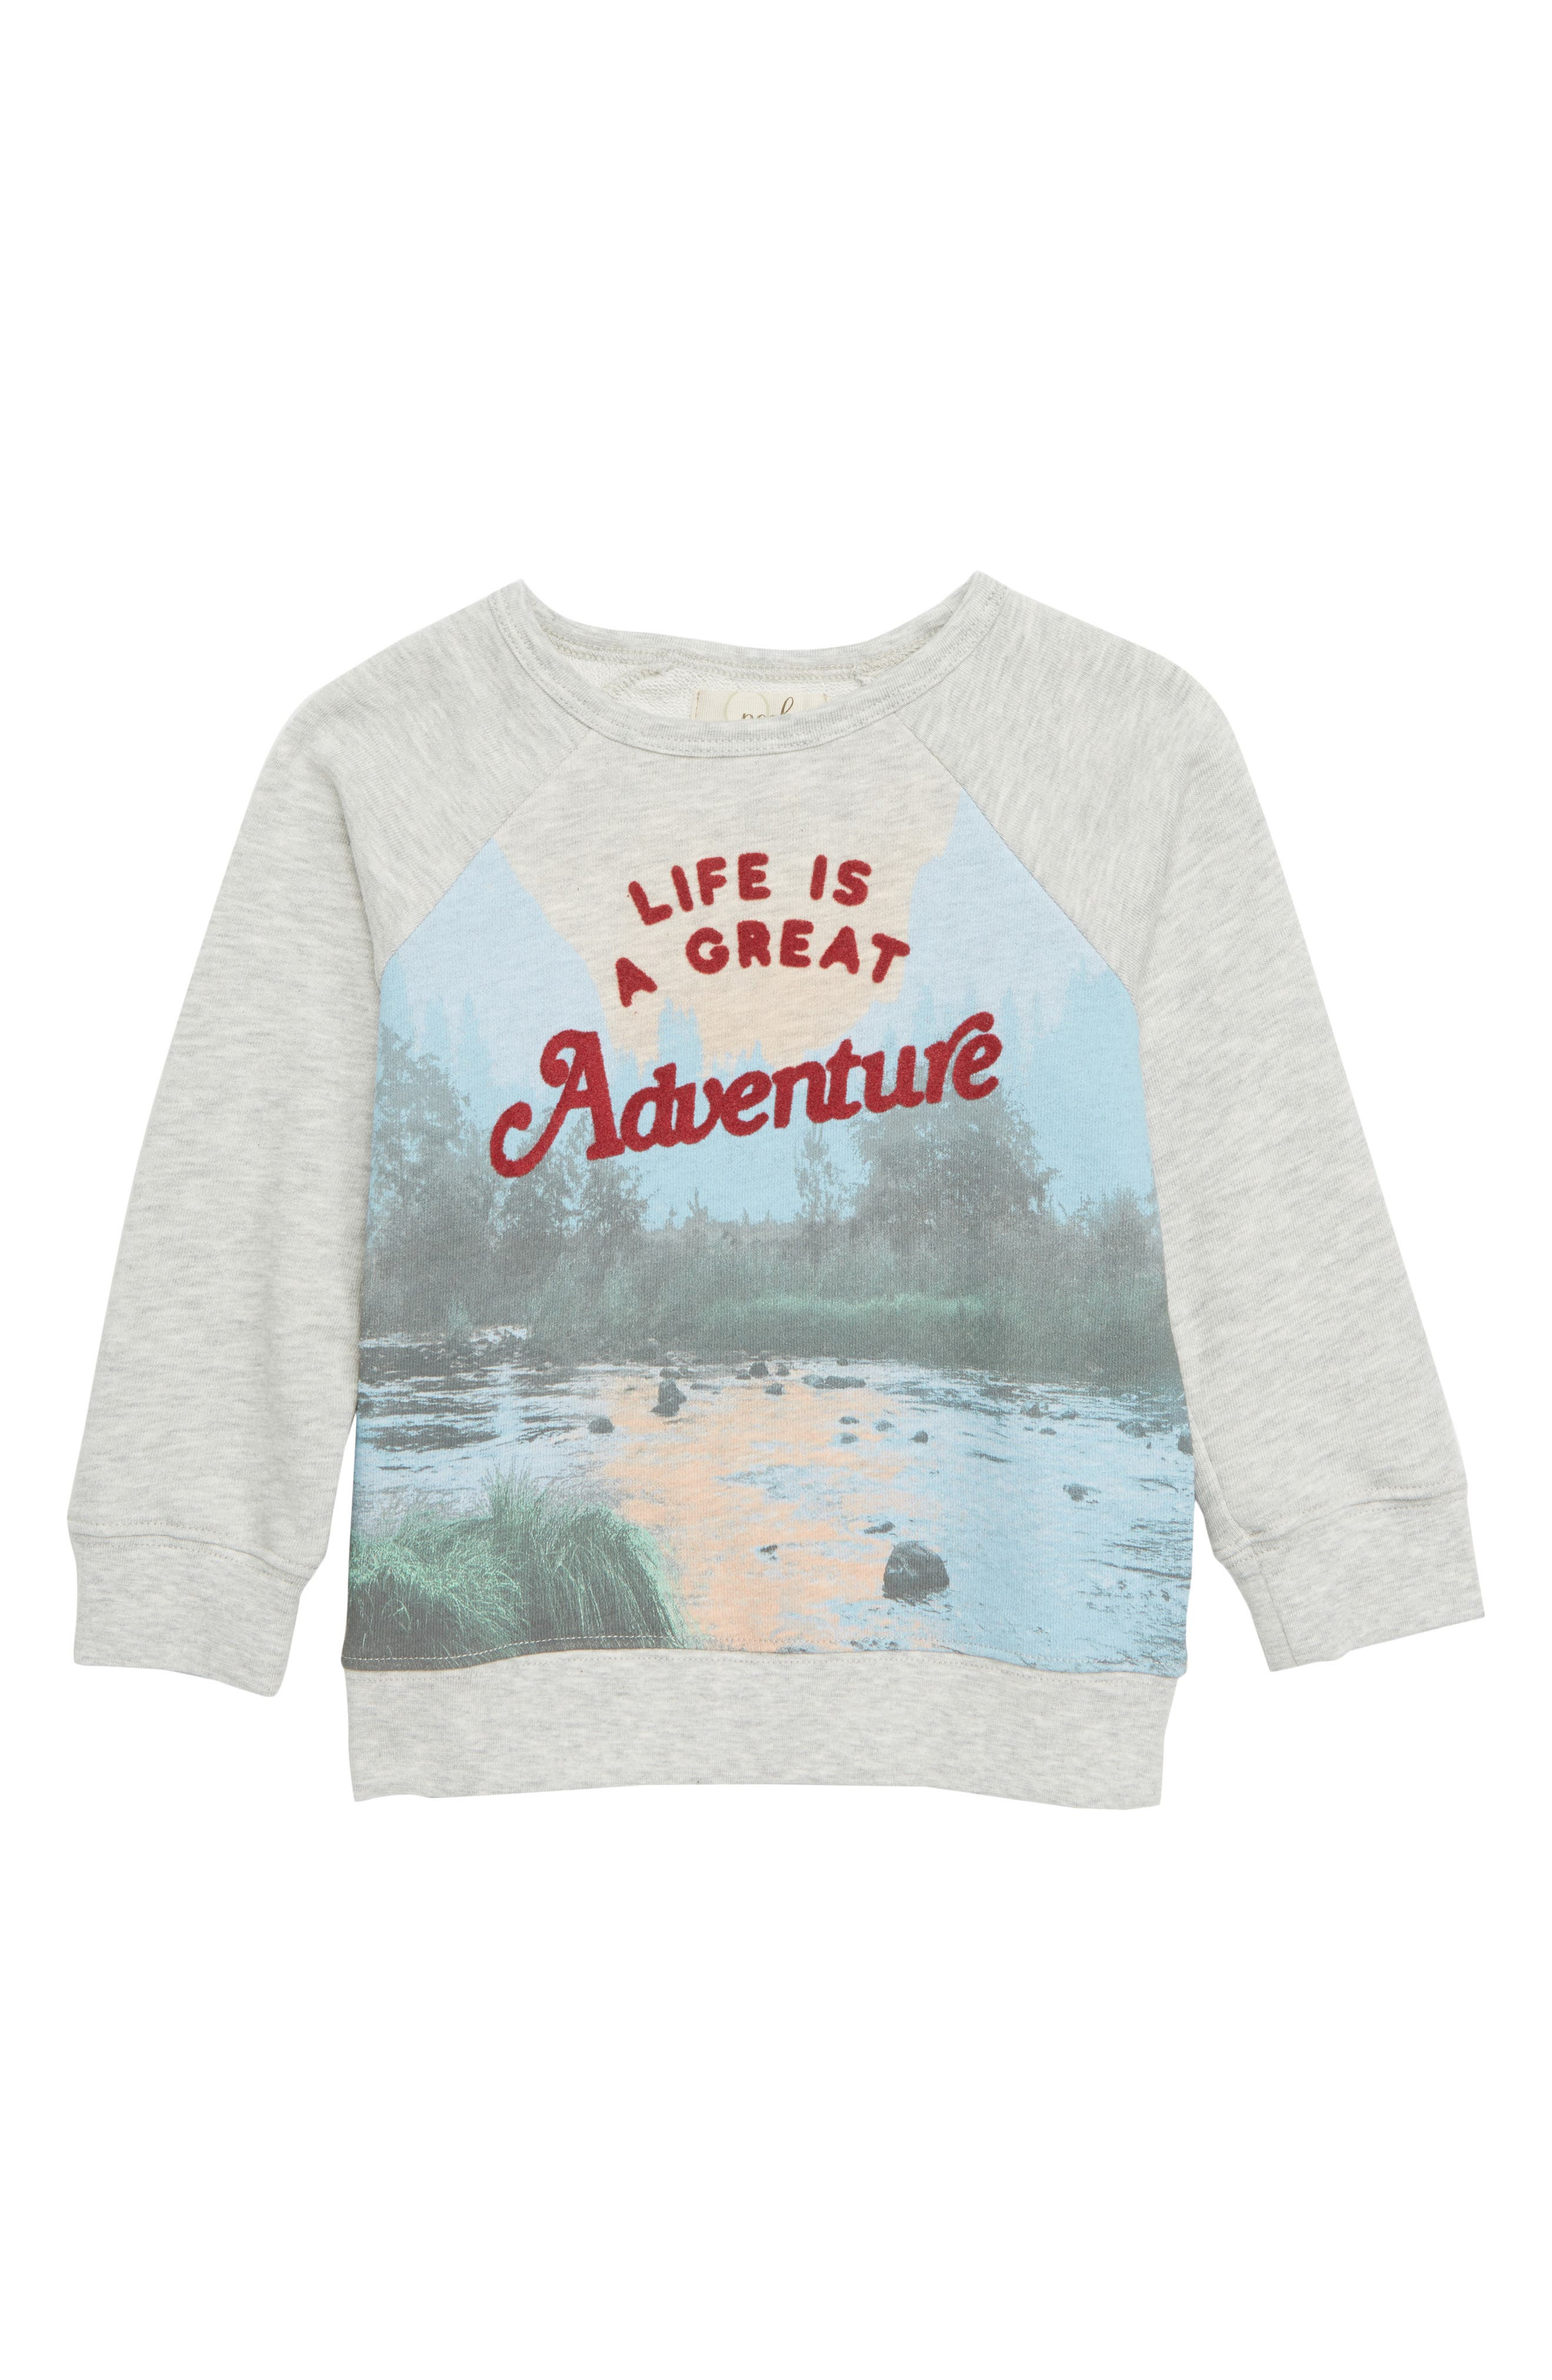 Adventure Crew Graphic Sweatshirt,                             Main thumbnail 1, color,                             LIGHT HEATHER GREY